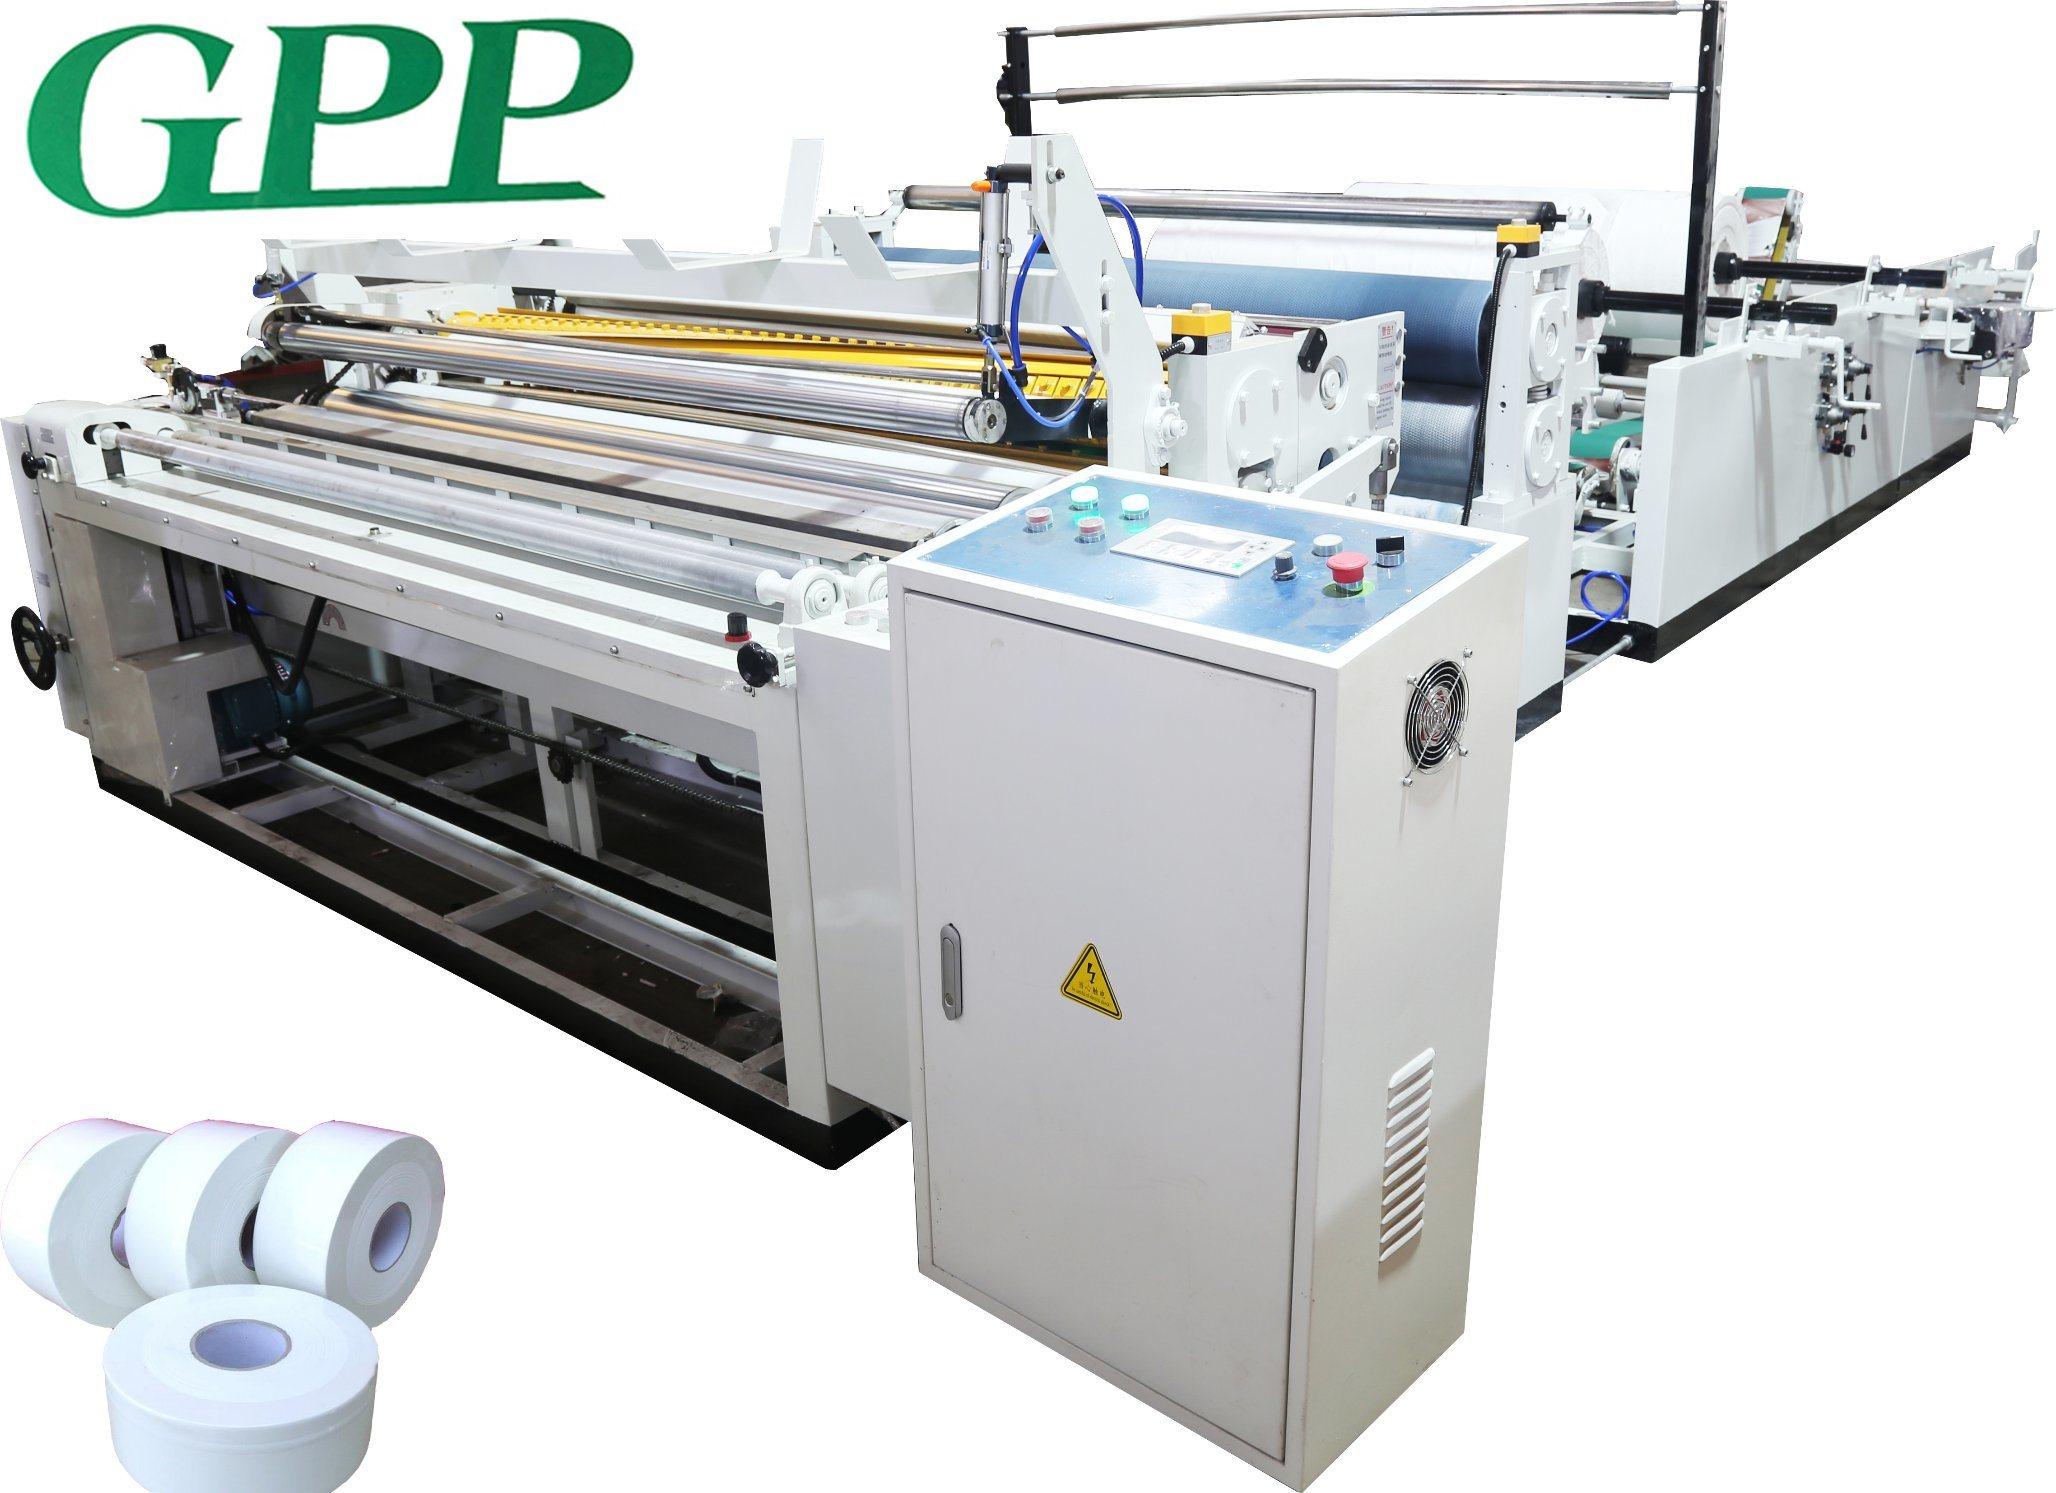 Full-Automatic Jumbo Toilet Paper Prodution Line Machine